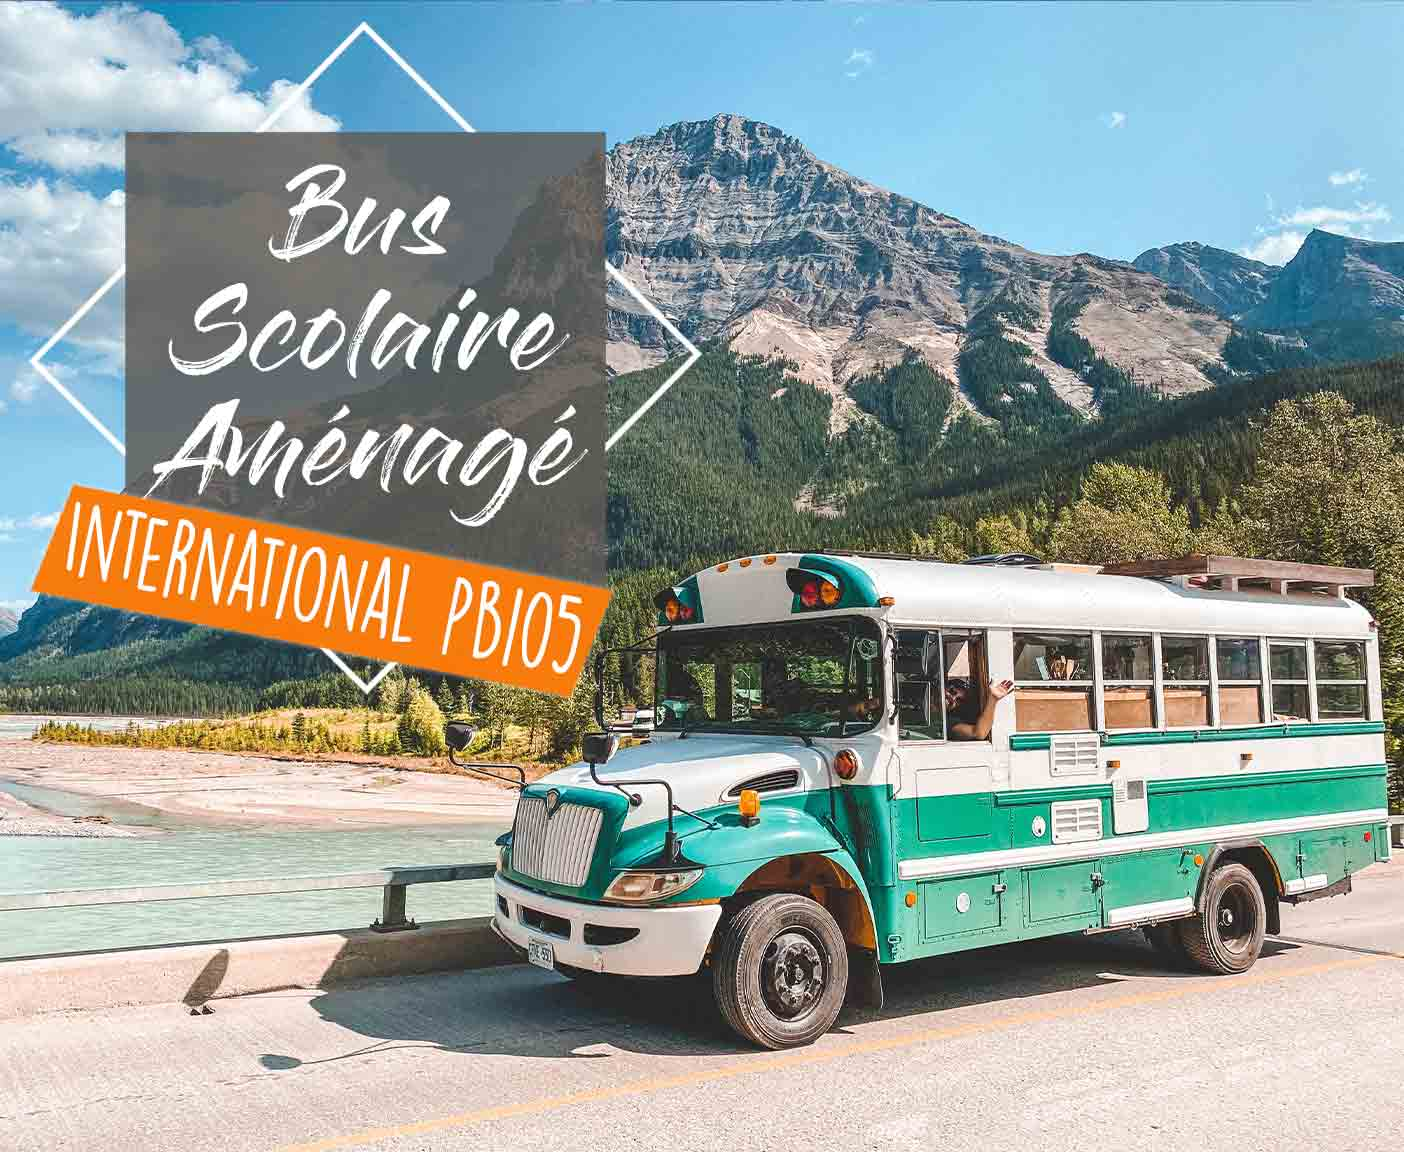 bus-scolaire-van-fourgon-camion-car-amenage-camping-car-vanlife-roadtrip-usa-canada-international-pb-105